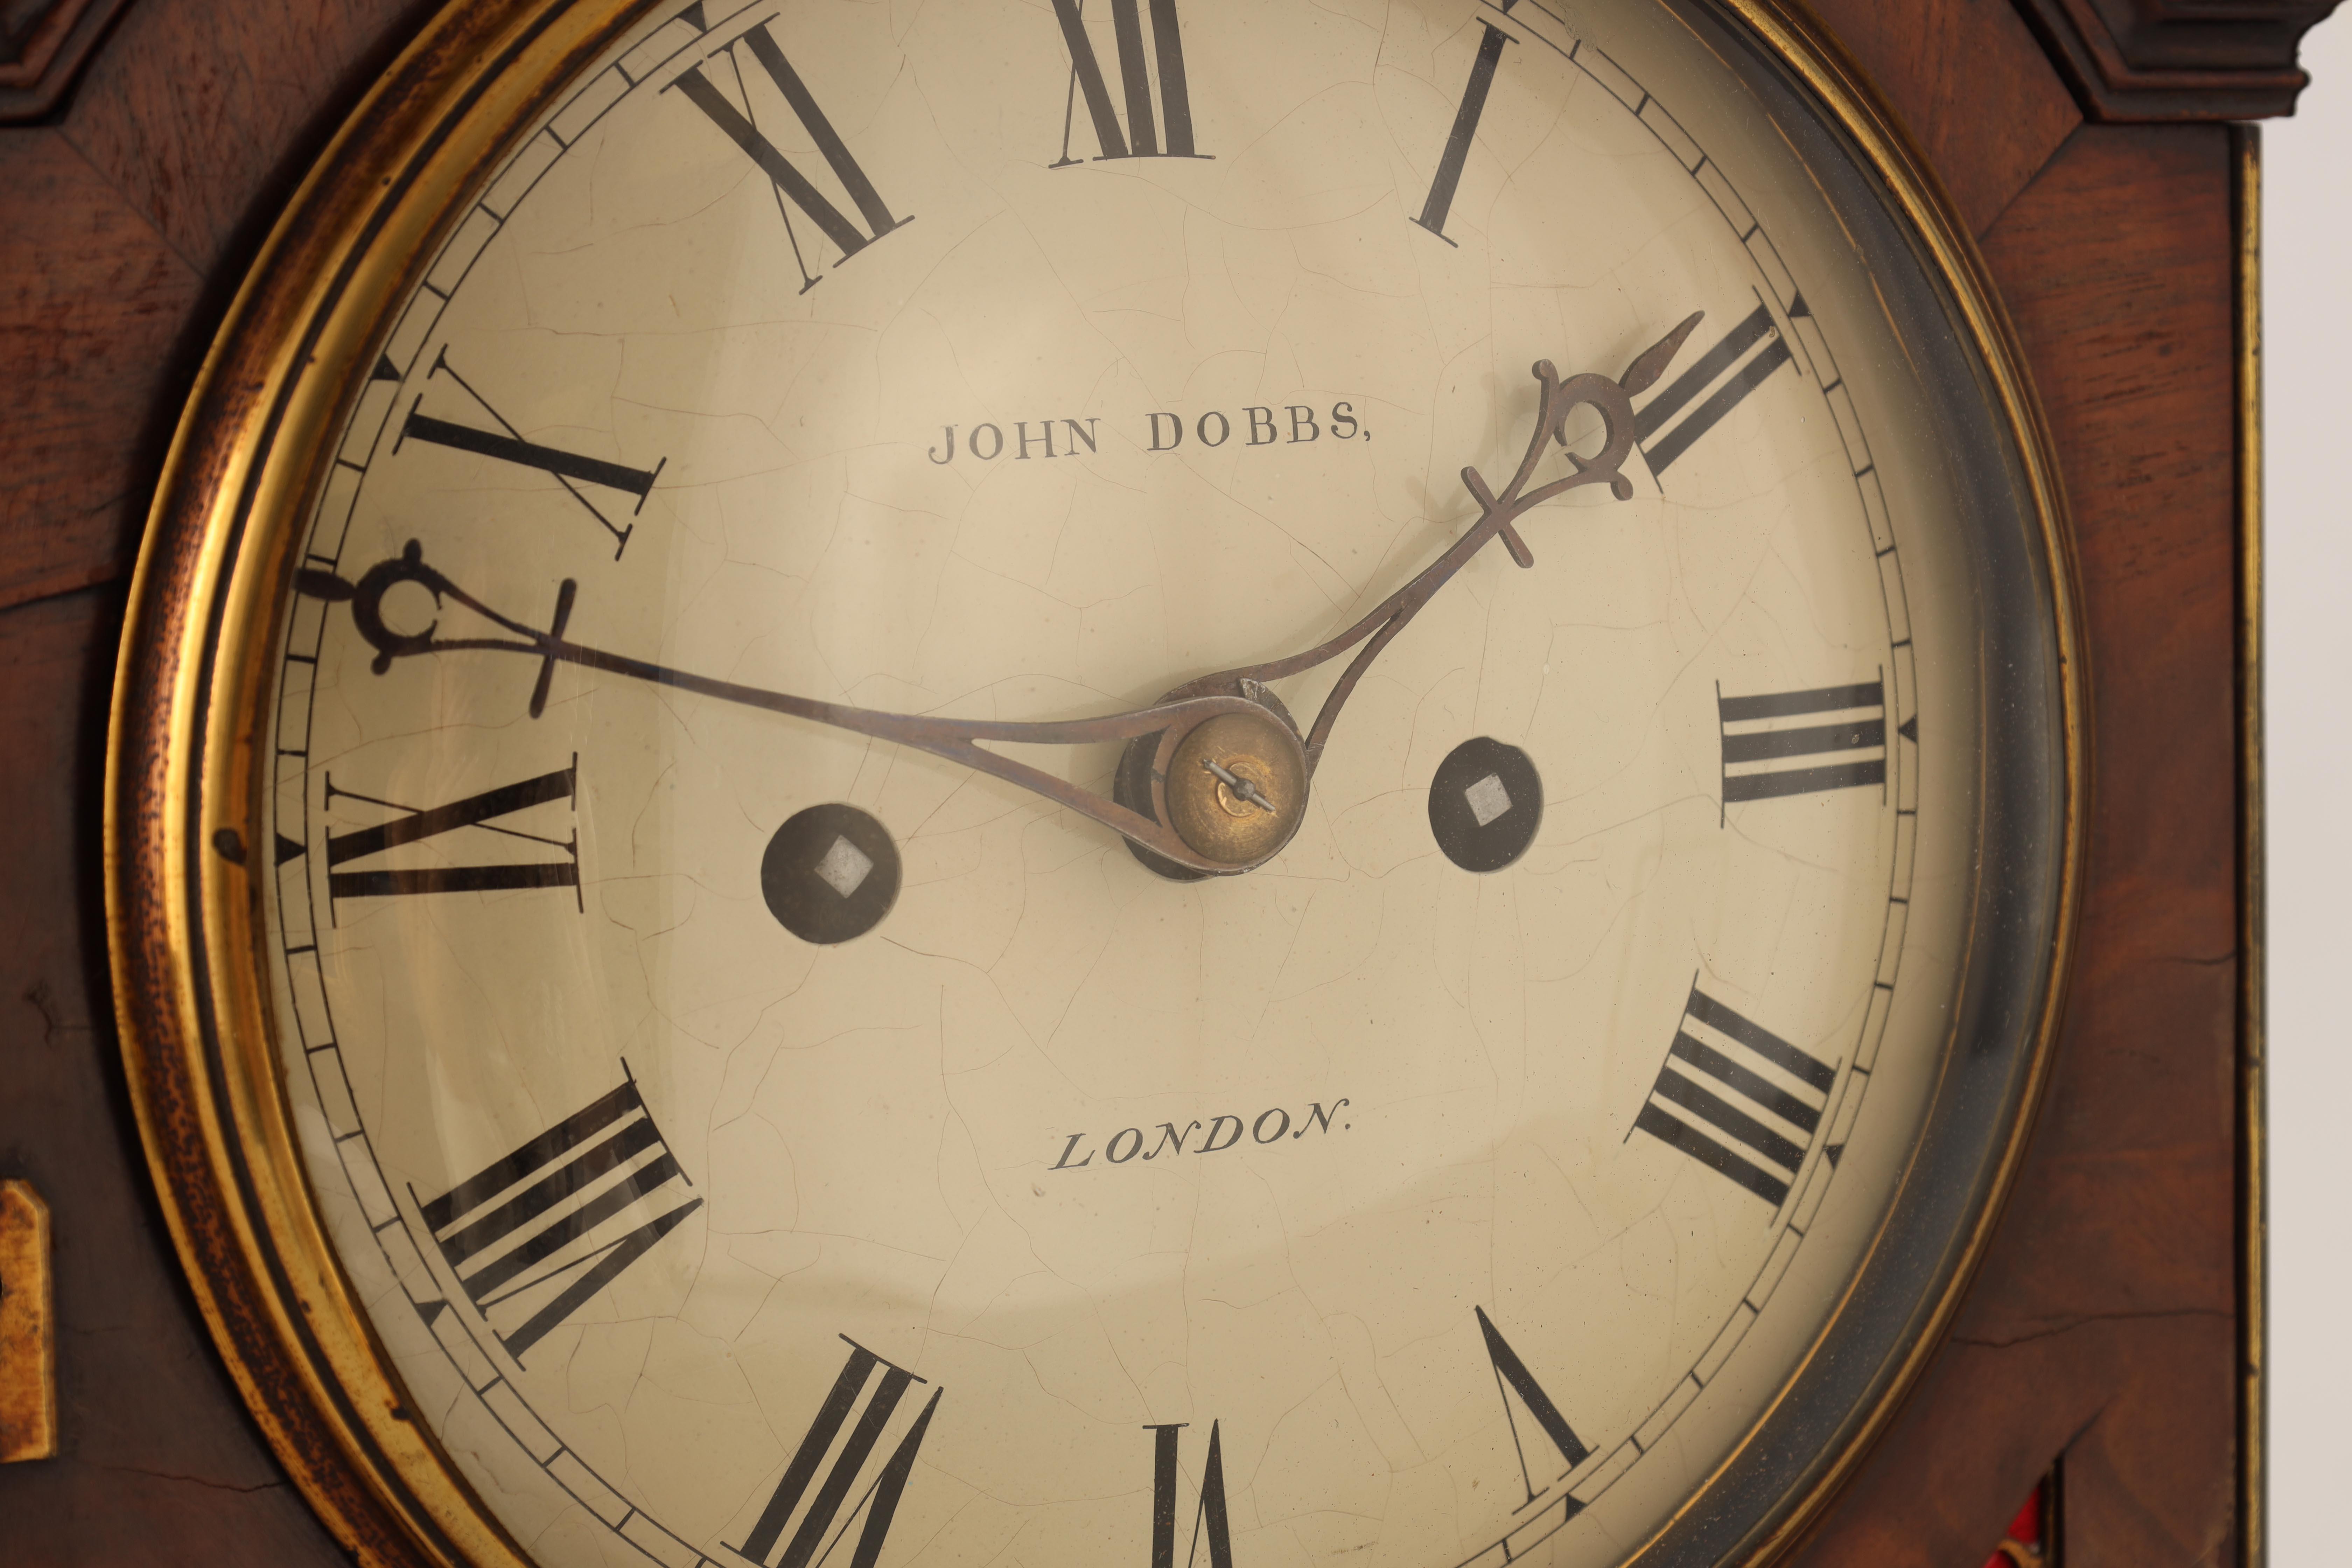 JOHN DOBBS, LONDON A LATE GEORGE III MAHOGANY VERGE BRACKET CLOCK the figured mahogany case with - Image 3 of 8